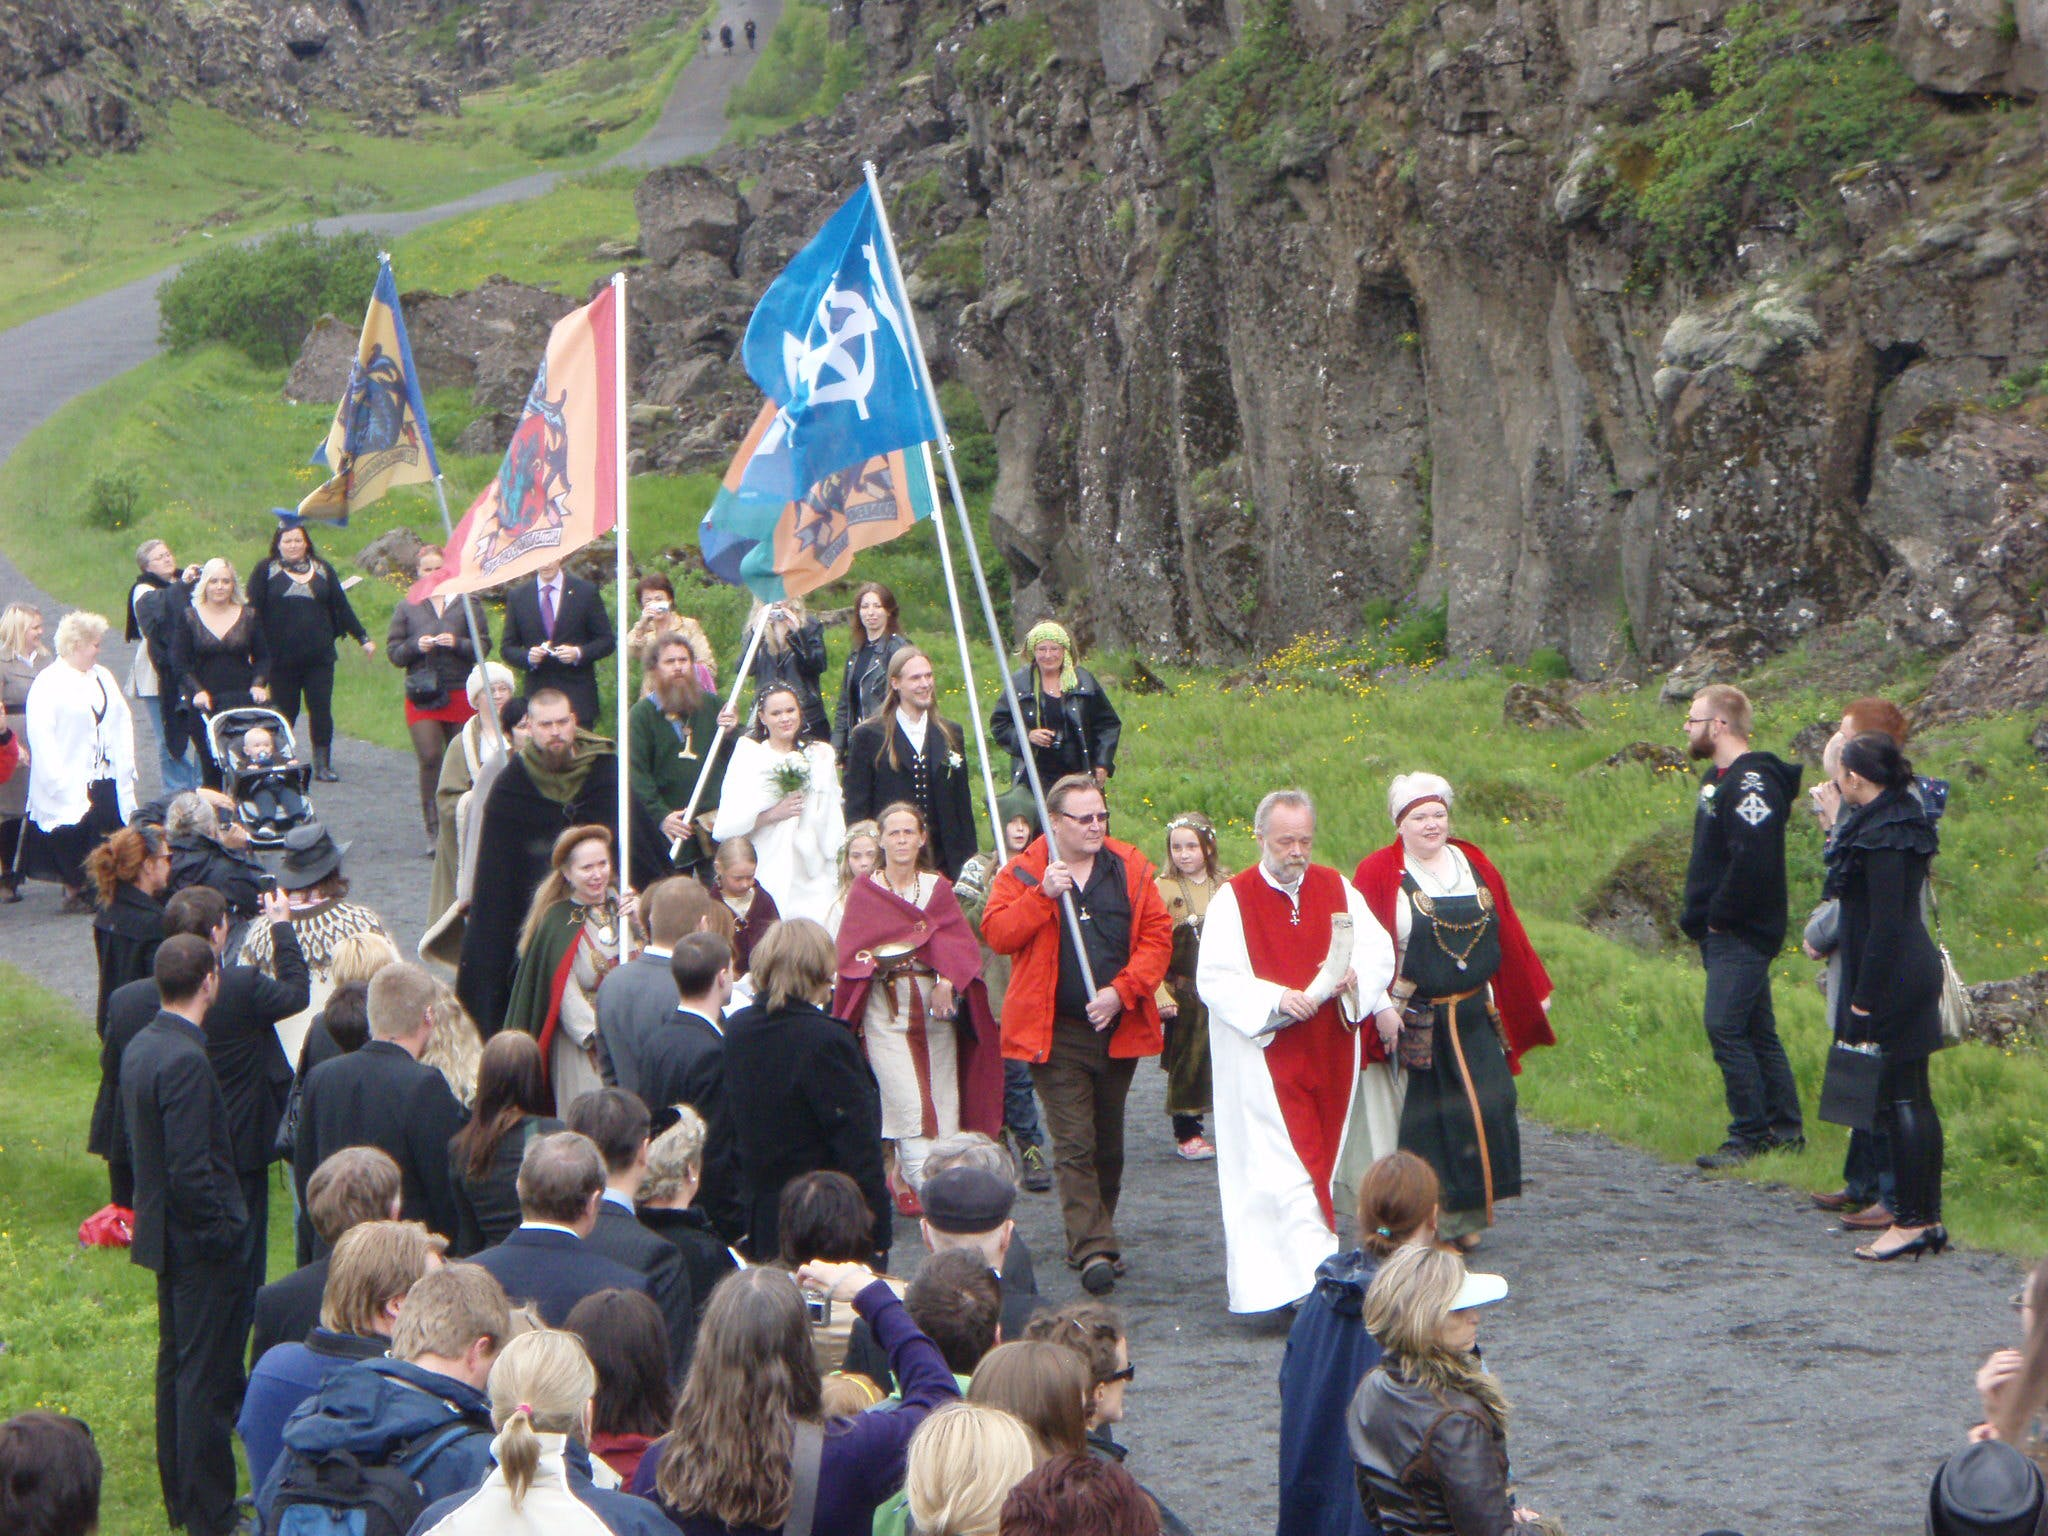 Ásatrúarfélagið parade at Thingvellir National Park.